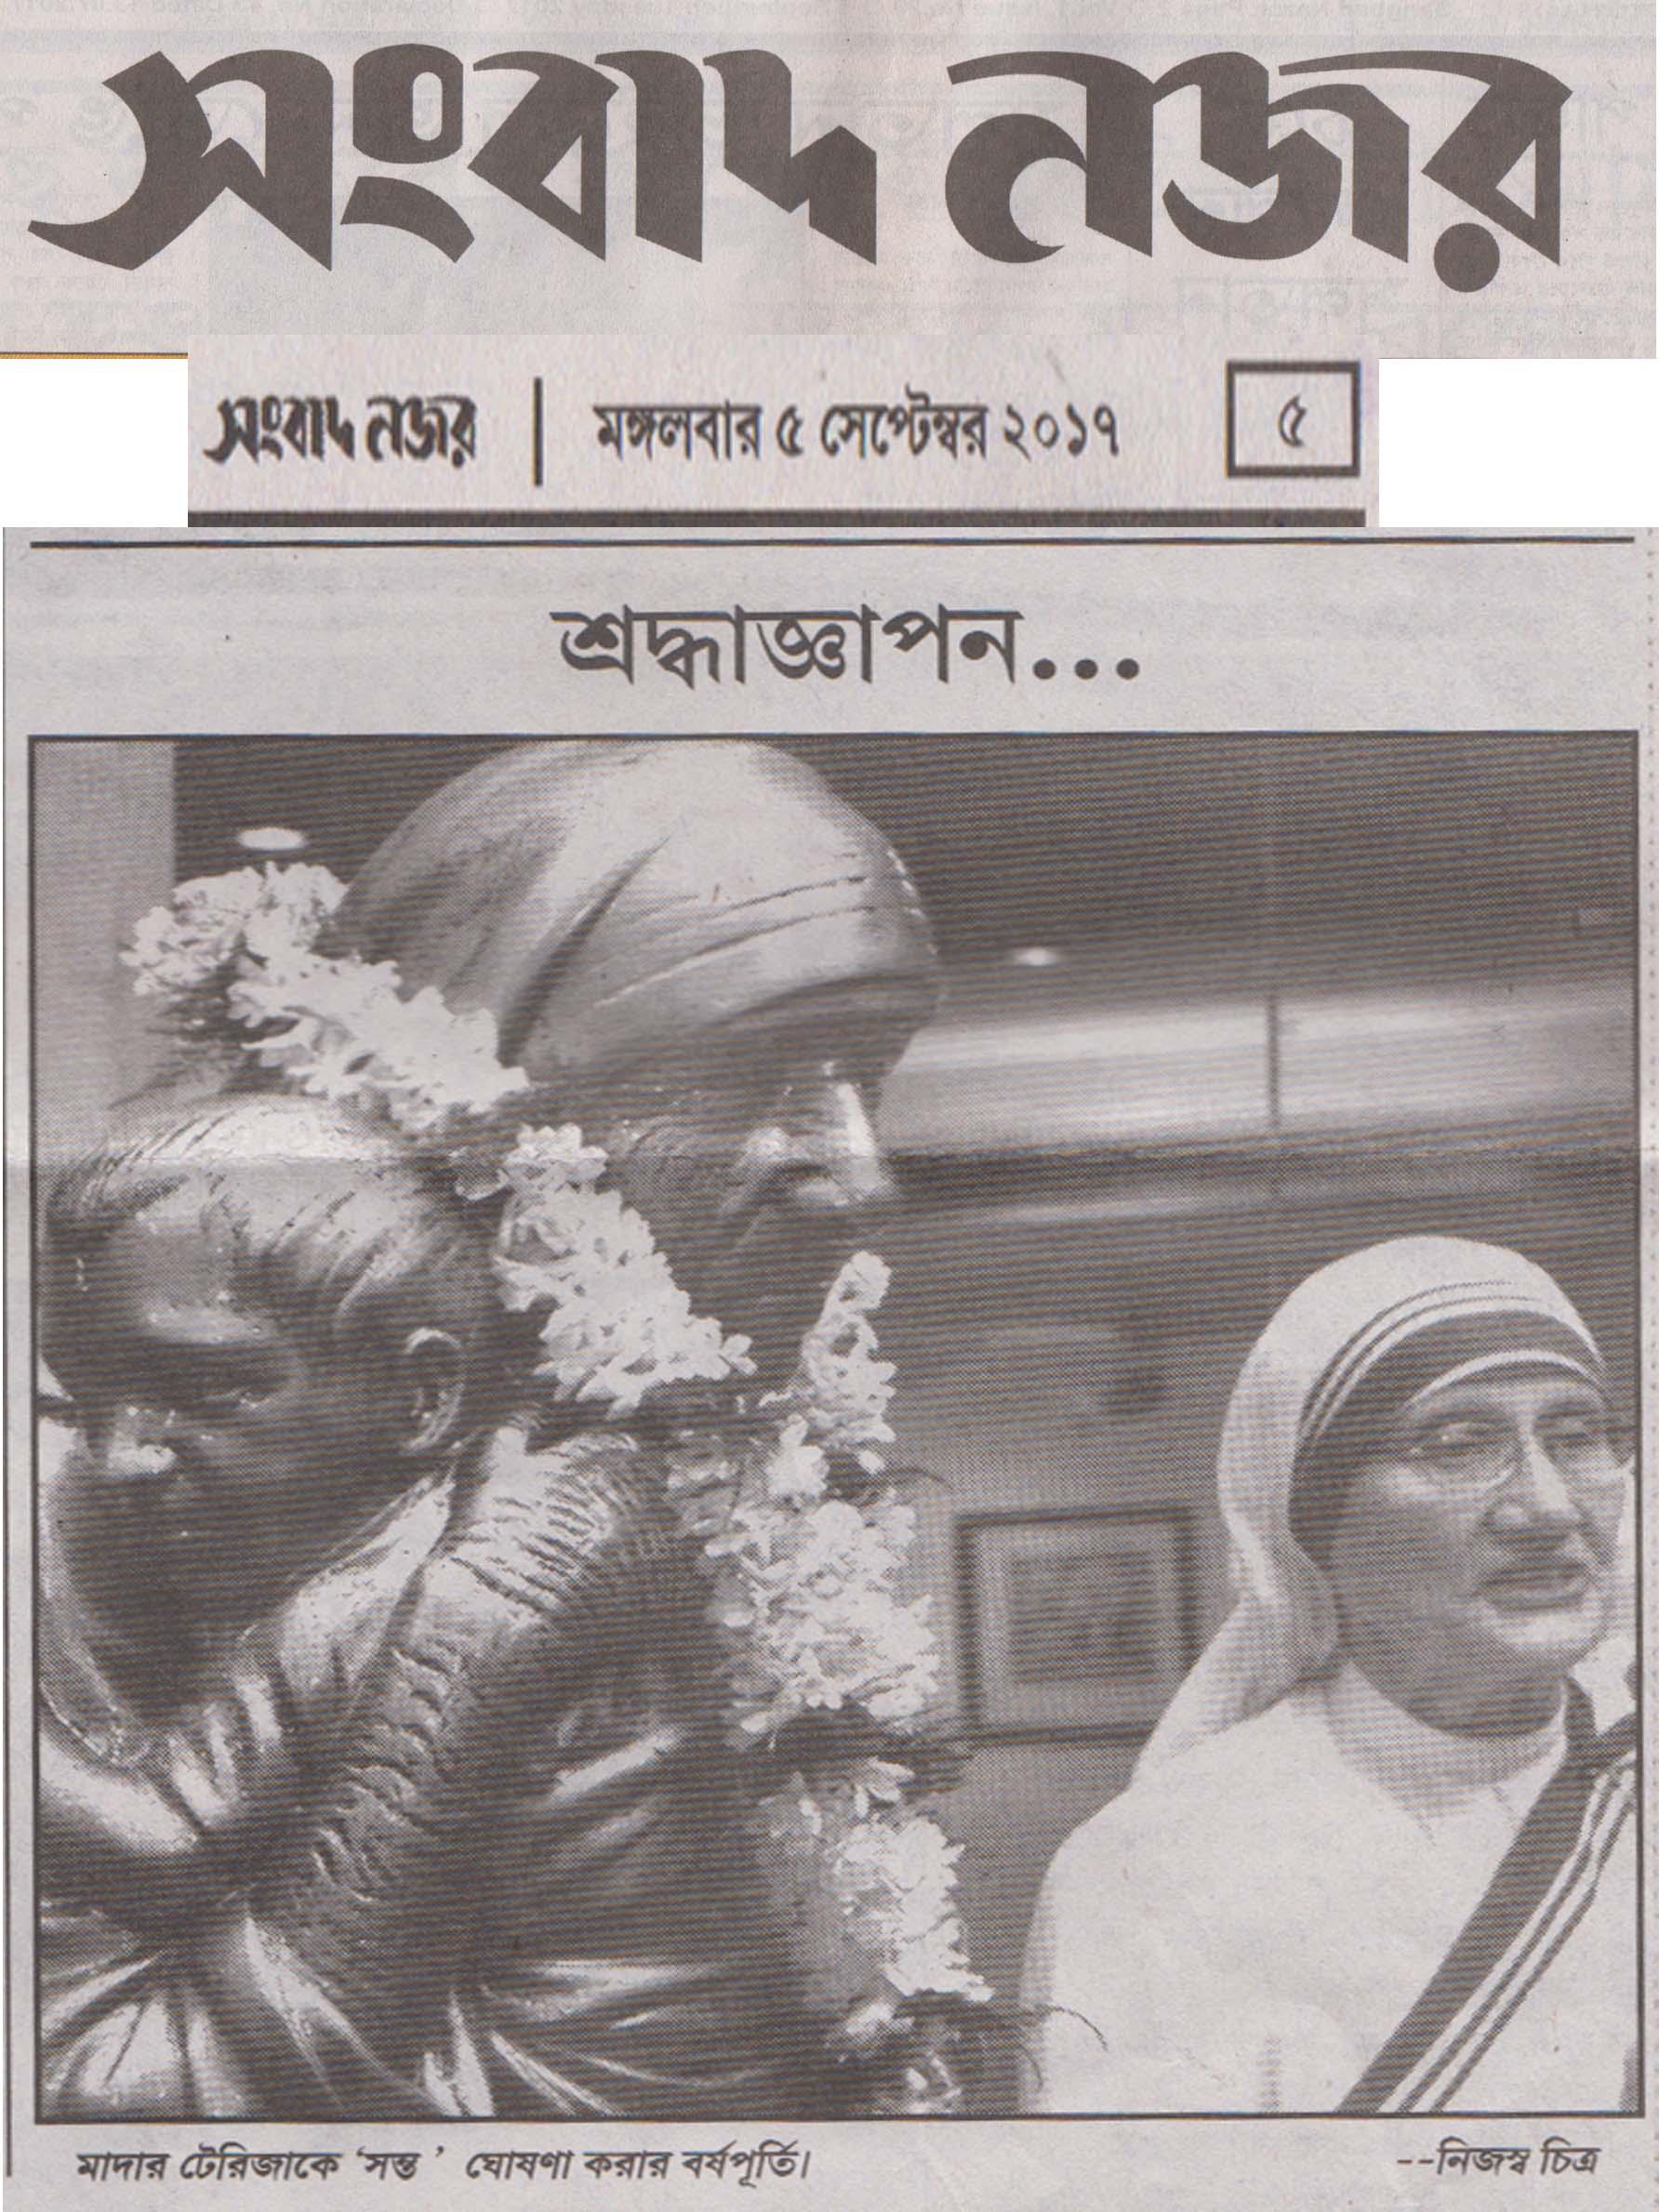 Mother Teresa, Sambad Najar, Page-5, Date-05.09.2017